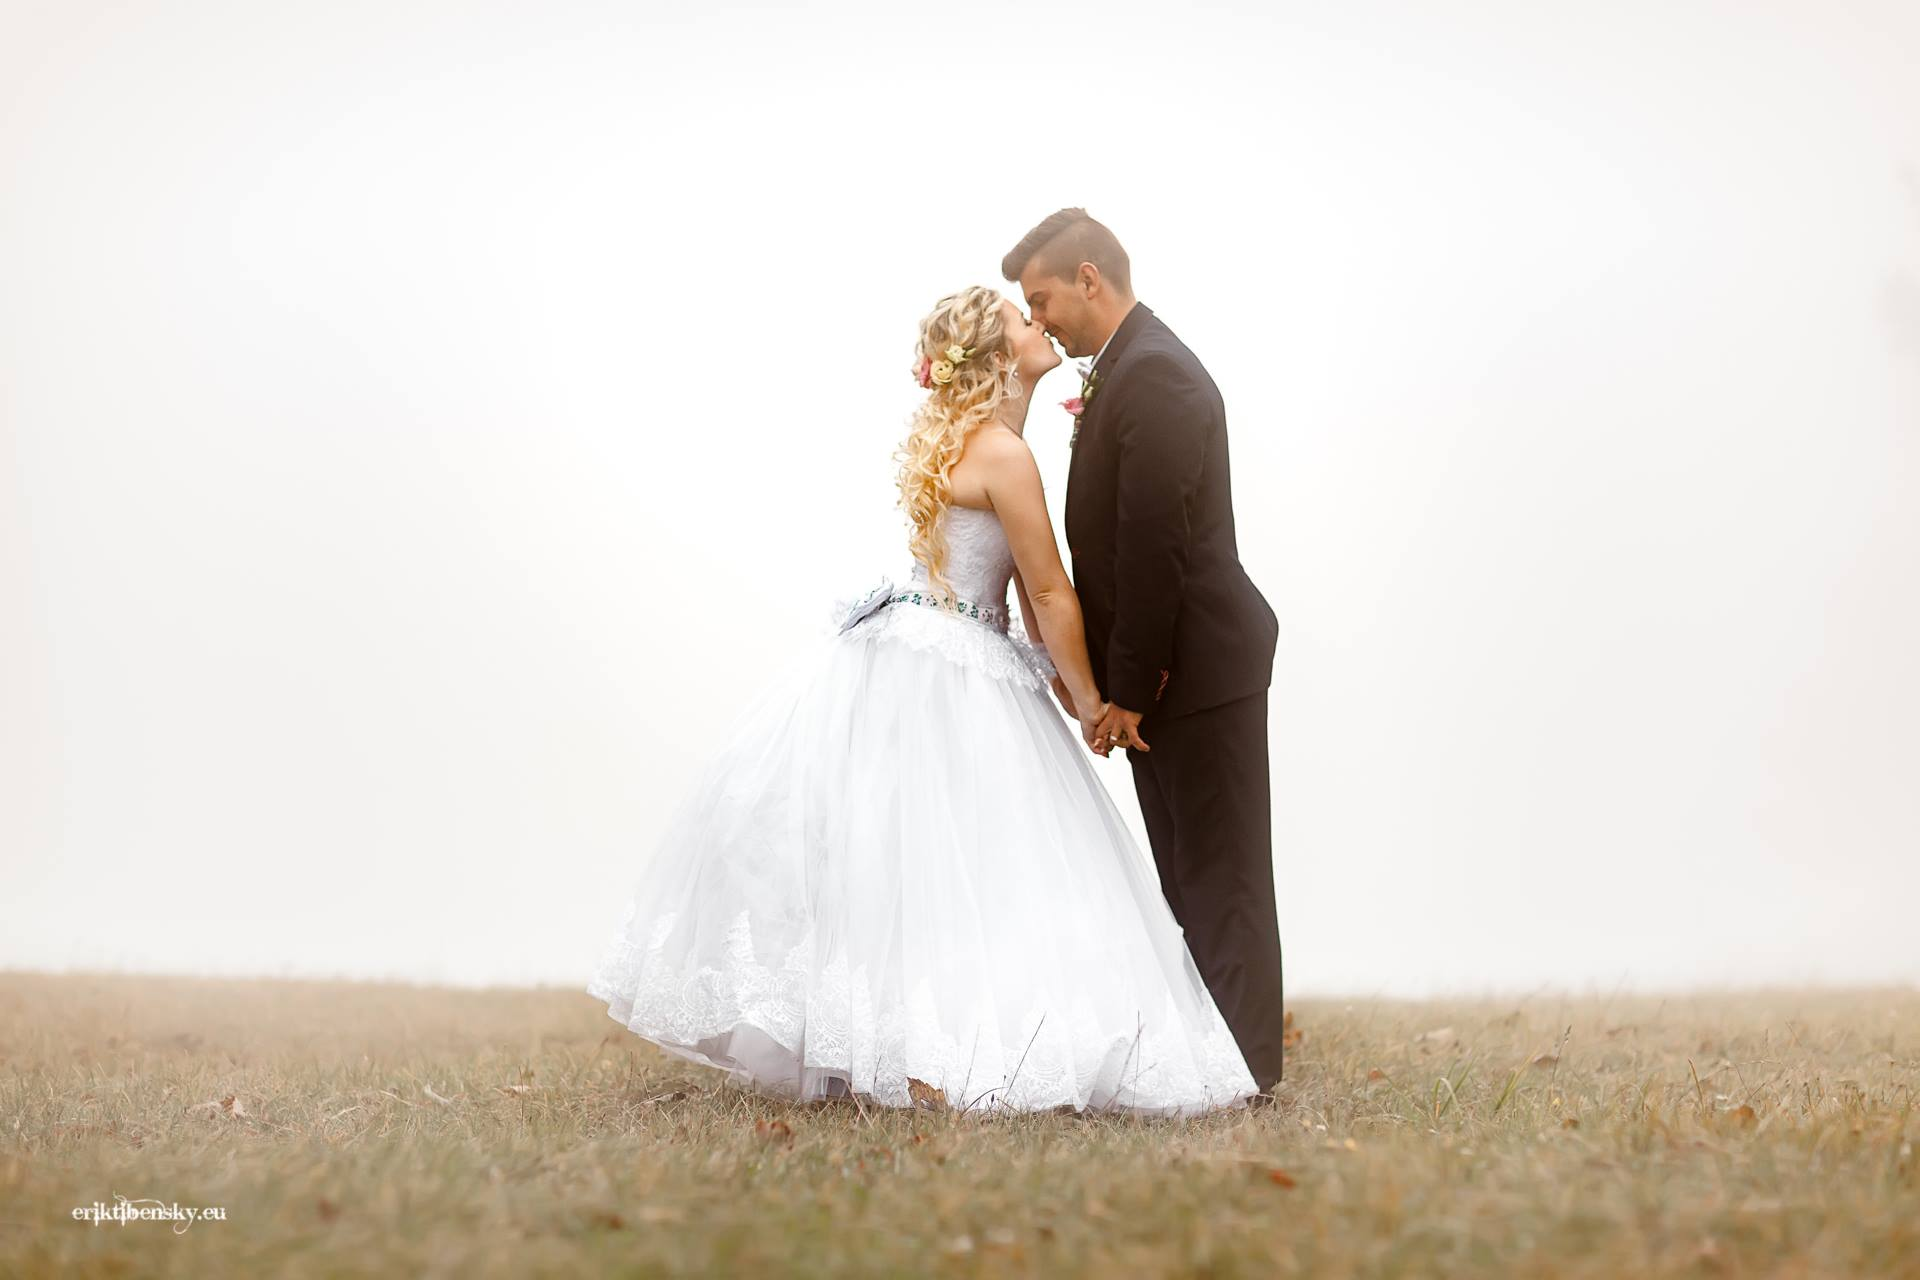 eriktibensky-eu-fotograf-wedding-photo-svadba-svadobny-pezinok-bratislava-modra-senec-1009